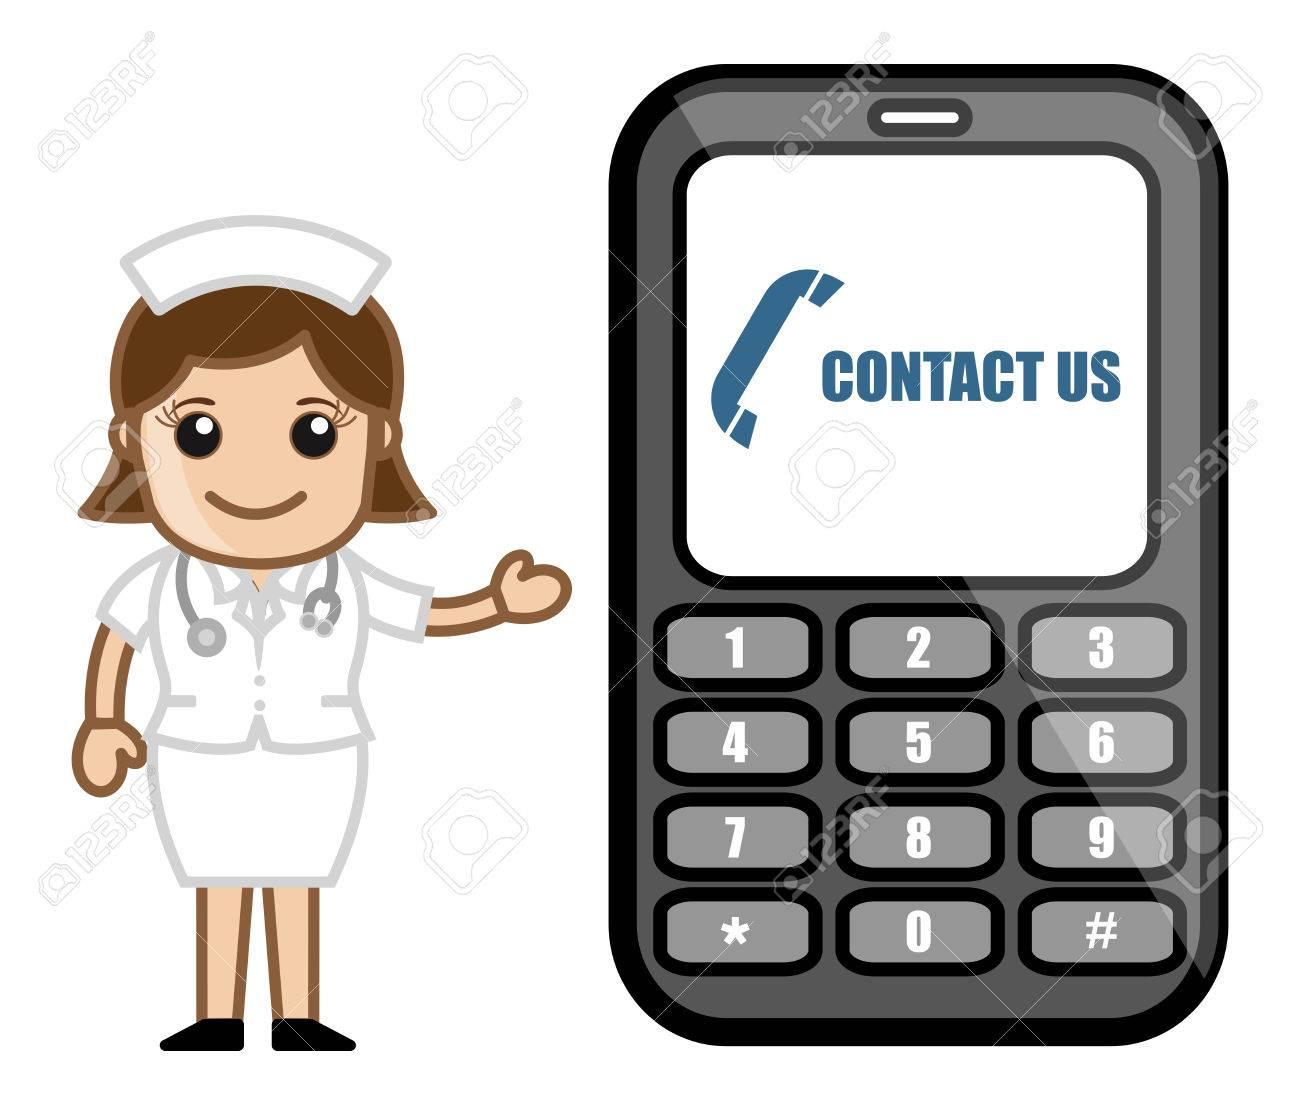 Contact Us via Phone - Medical Cartoon Vector Character Stock Vector - 22206827